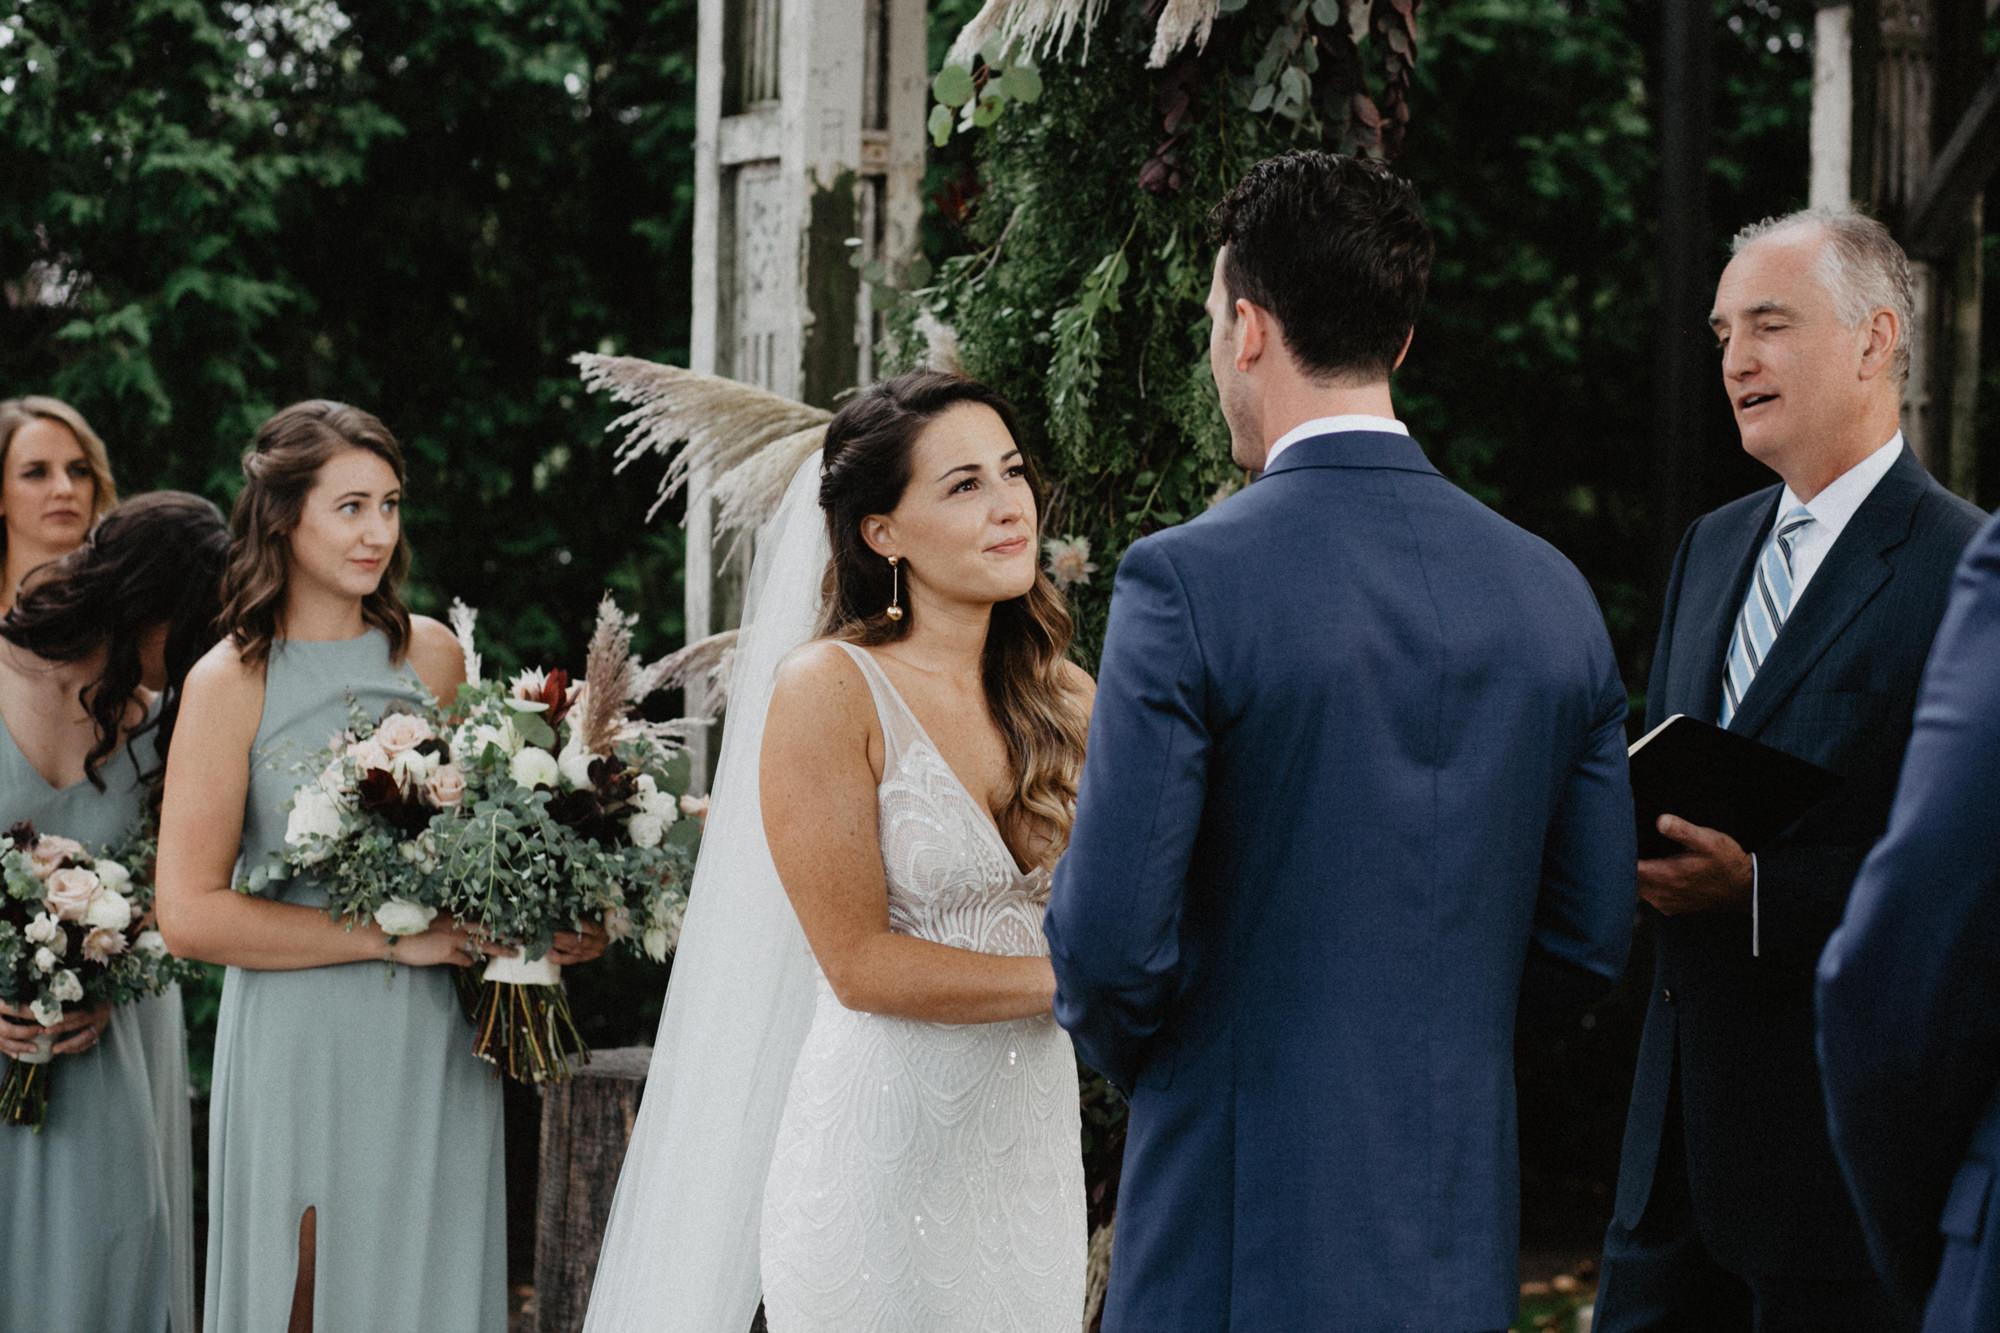 terrain-events-wedding-photographer-29.jpg